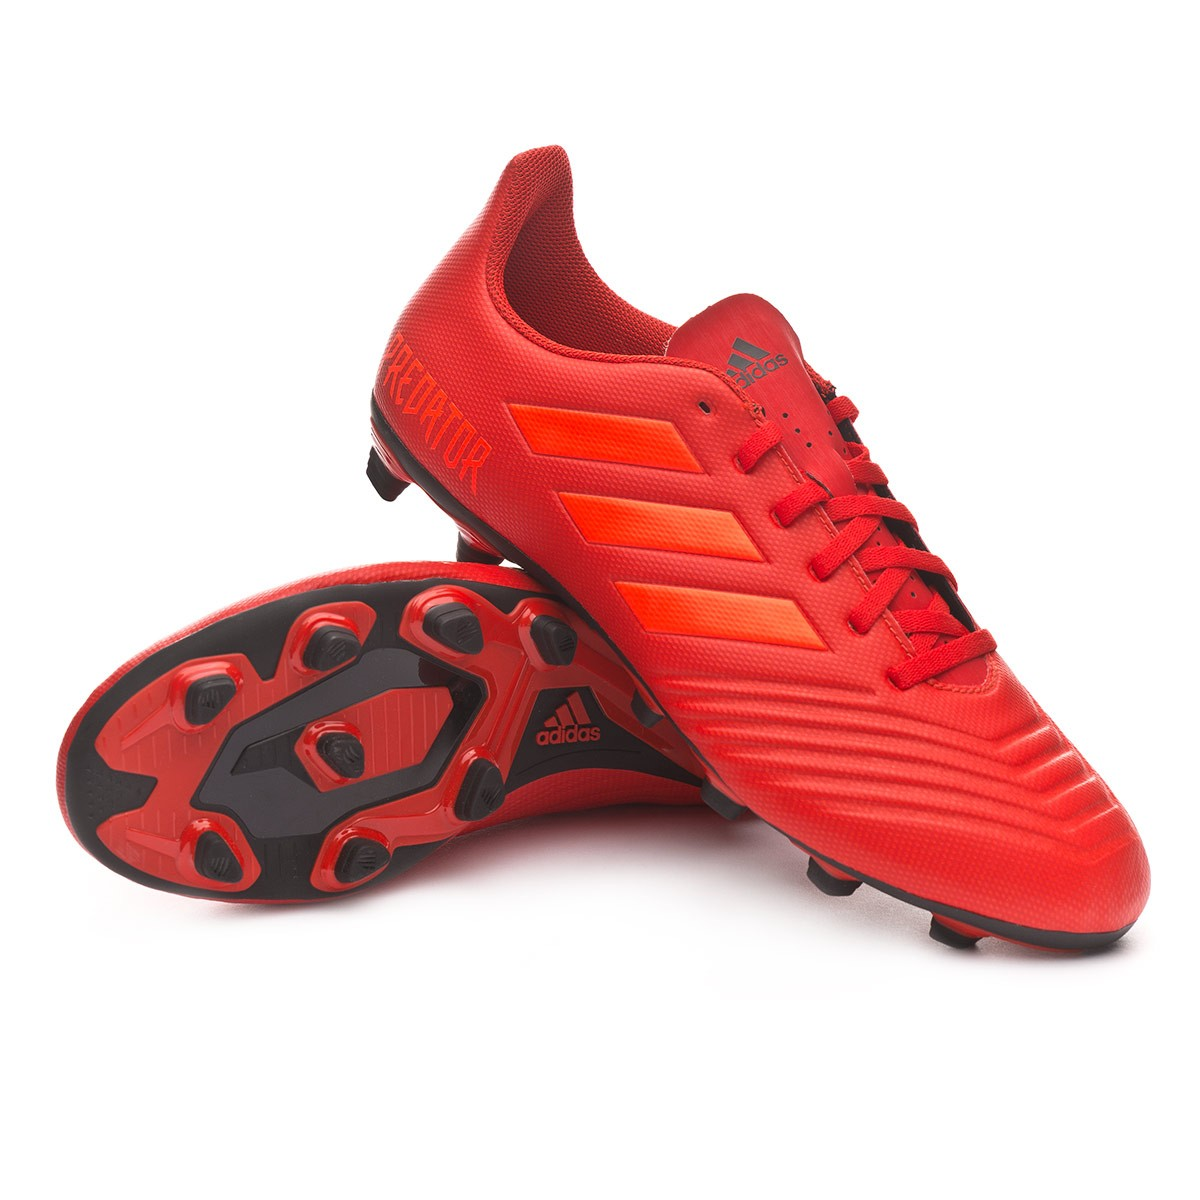 15829d0f321e5 Chuteira adidas Predator 19.4 FxG Active red-Solar red-Core black ...